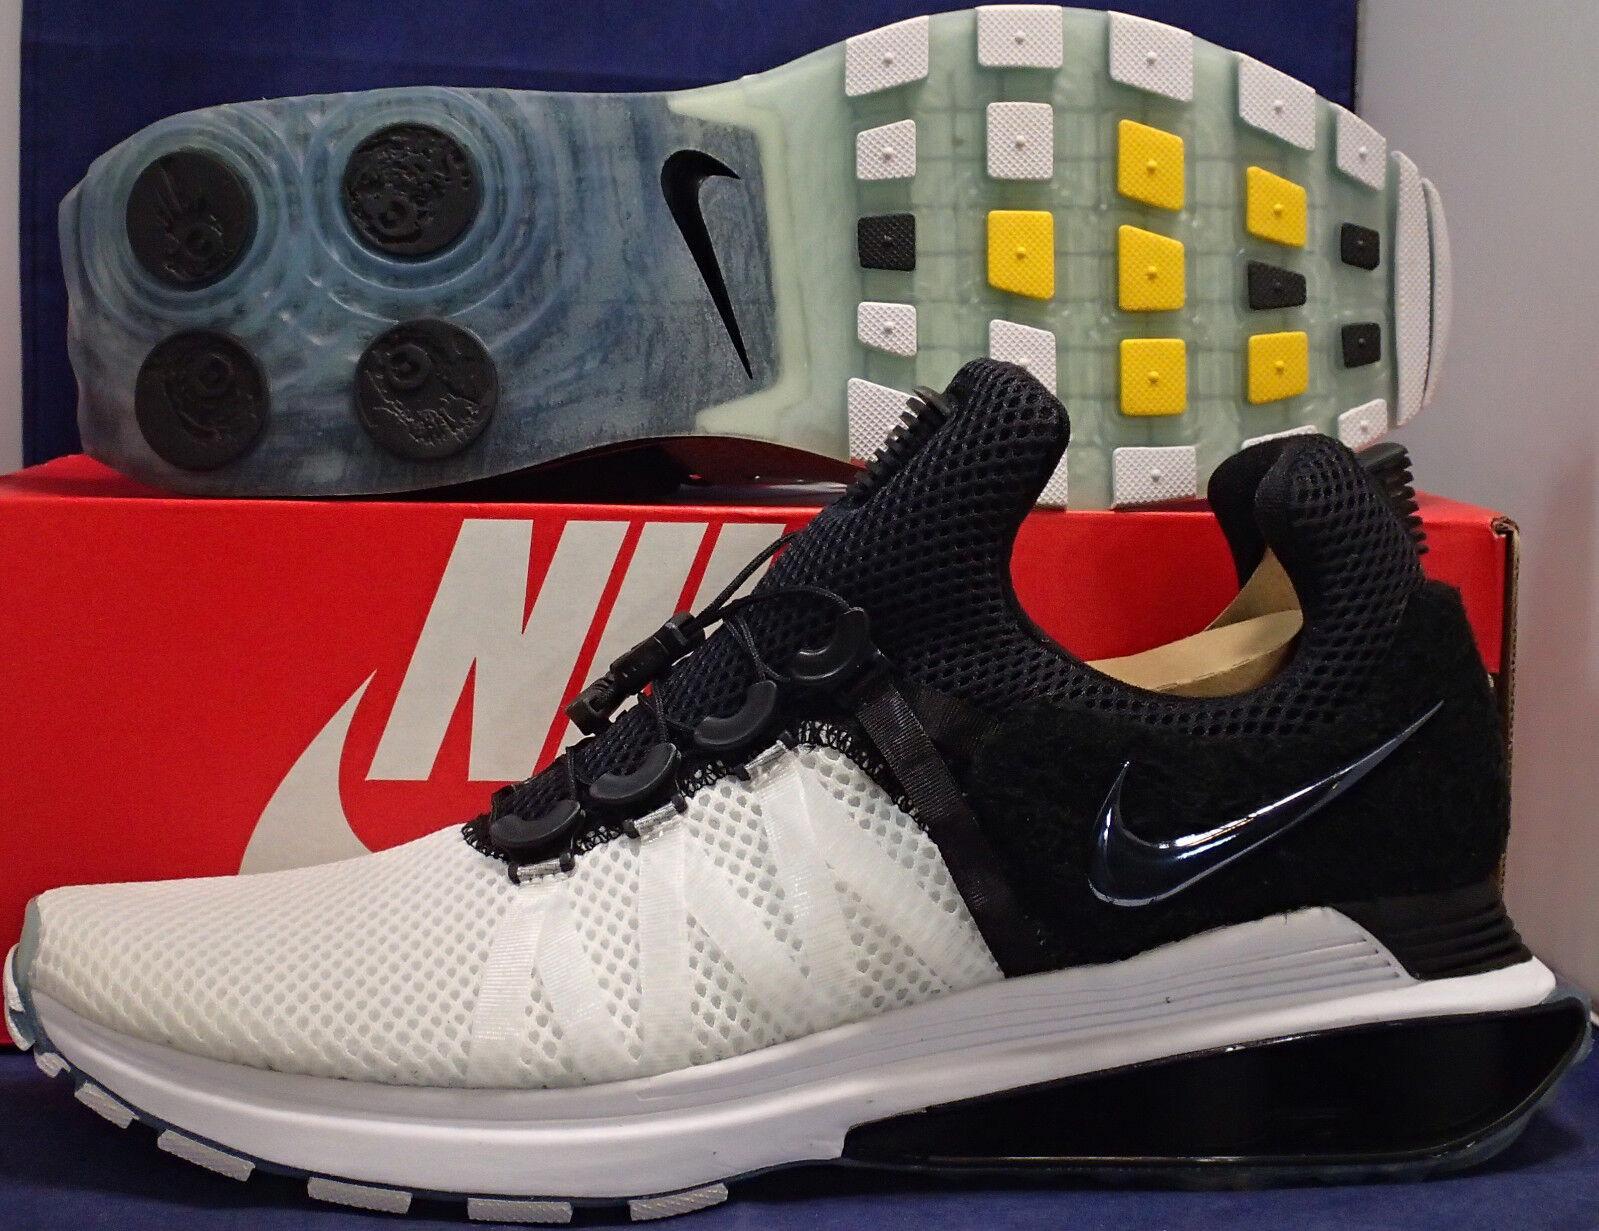 Nike nero shox gravità bianco nero Nike sz 10,5 101) (ar1999 101) 10,5 06e248   40cf92